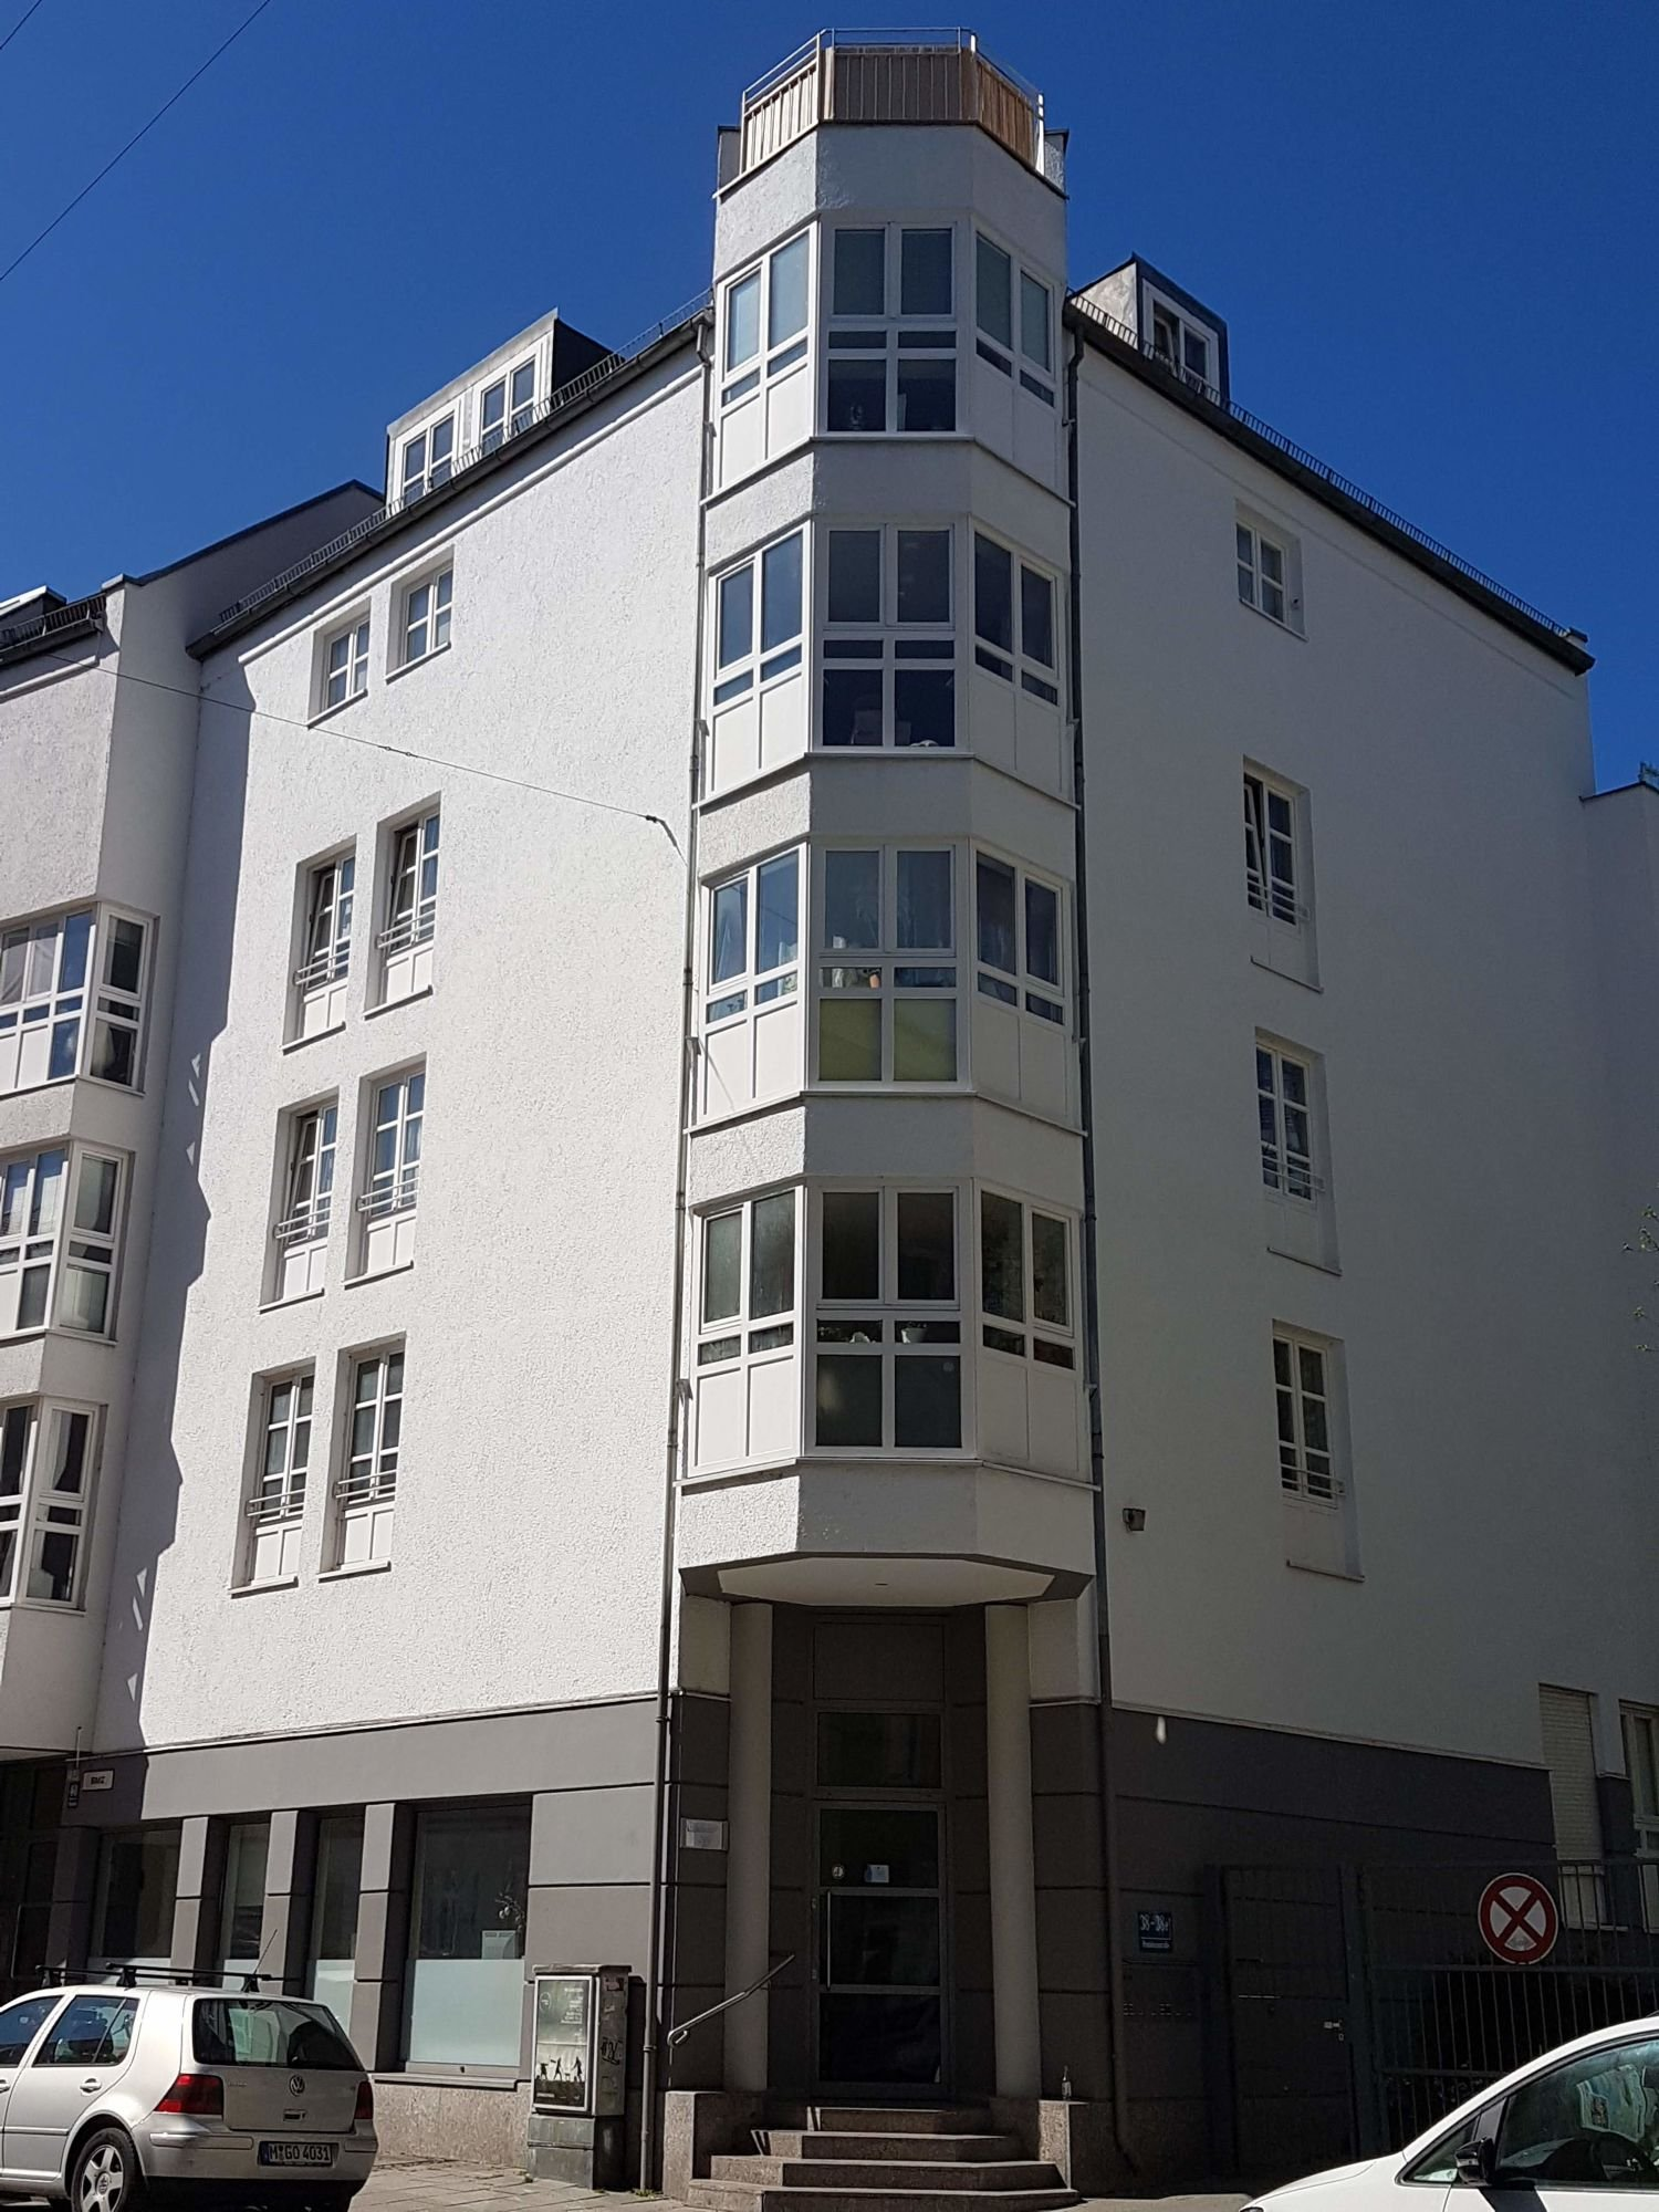 Pestalozzistraße